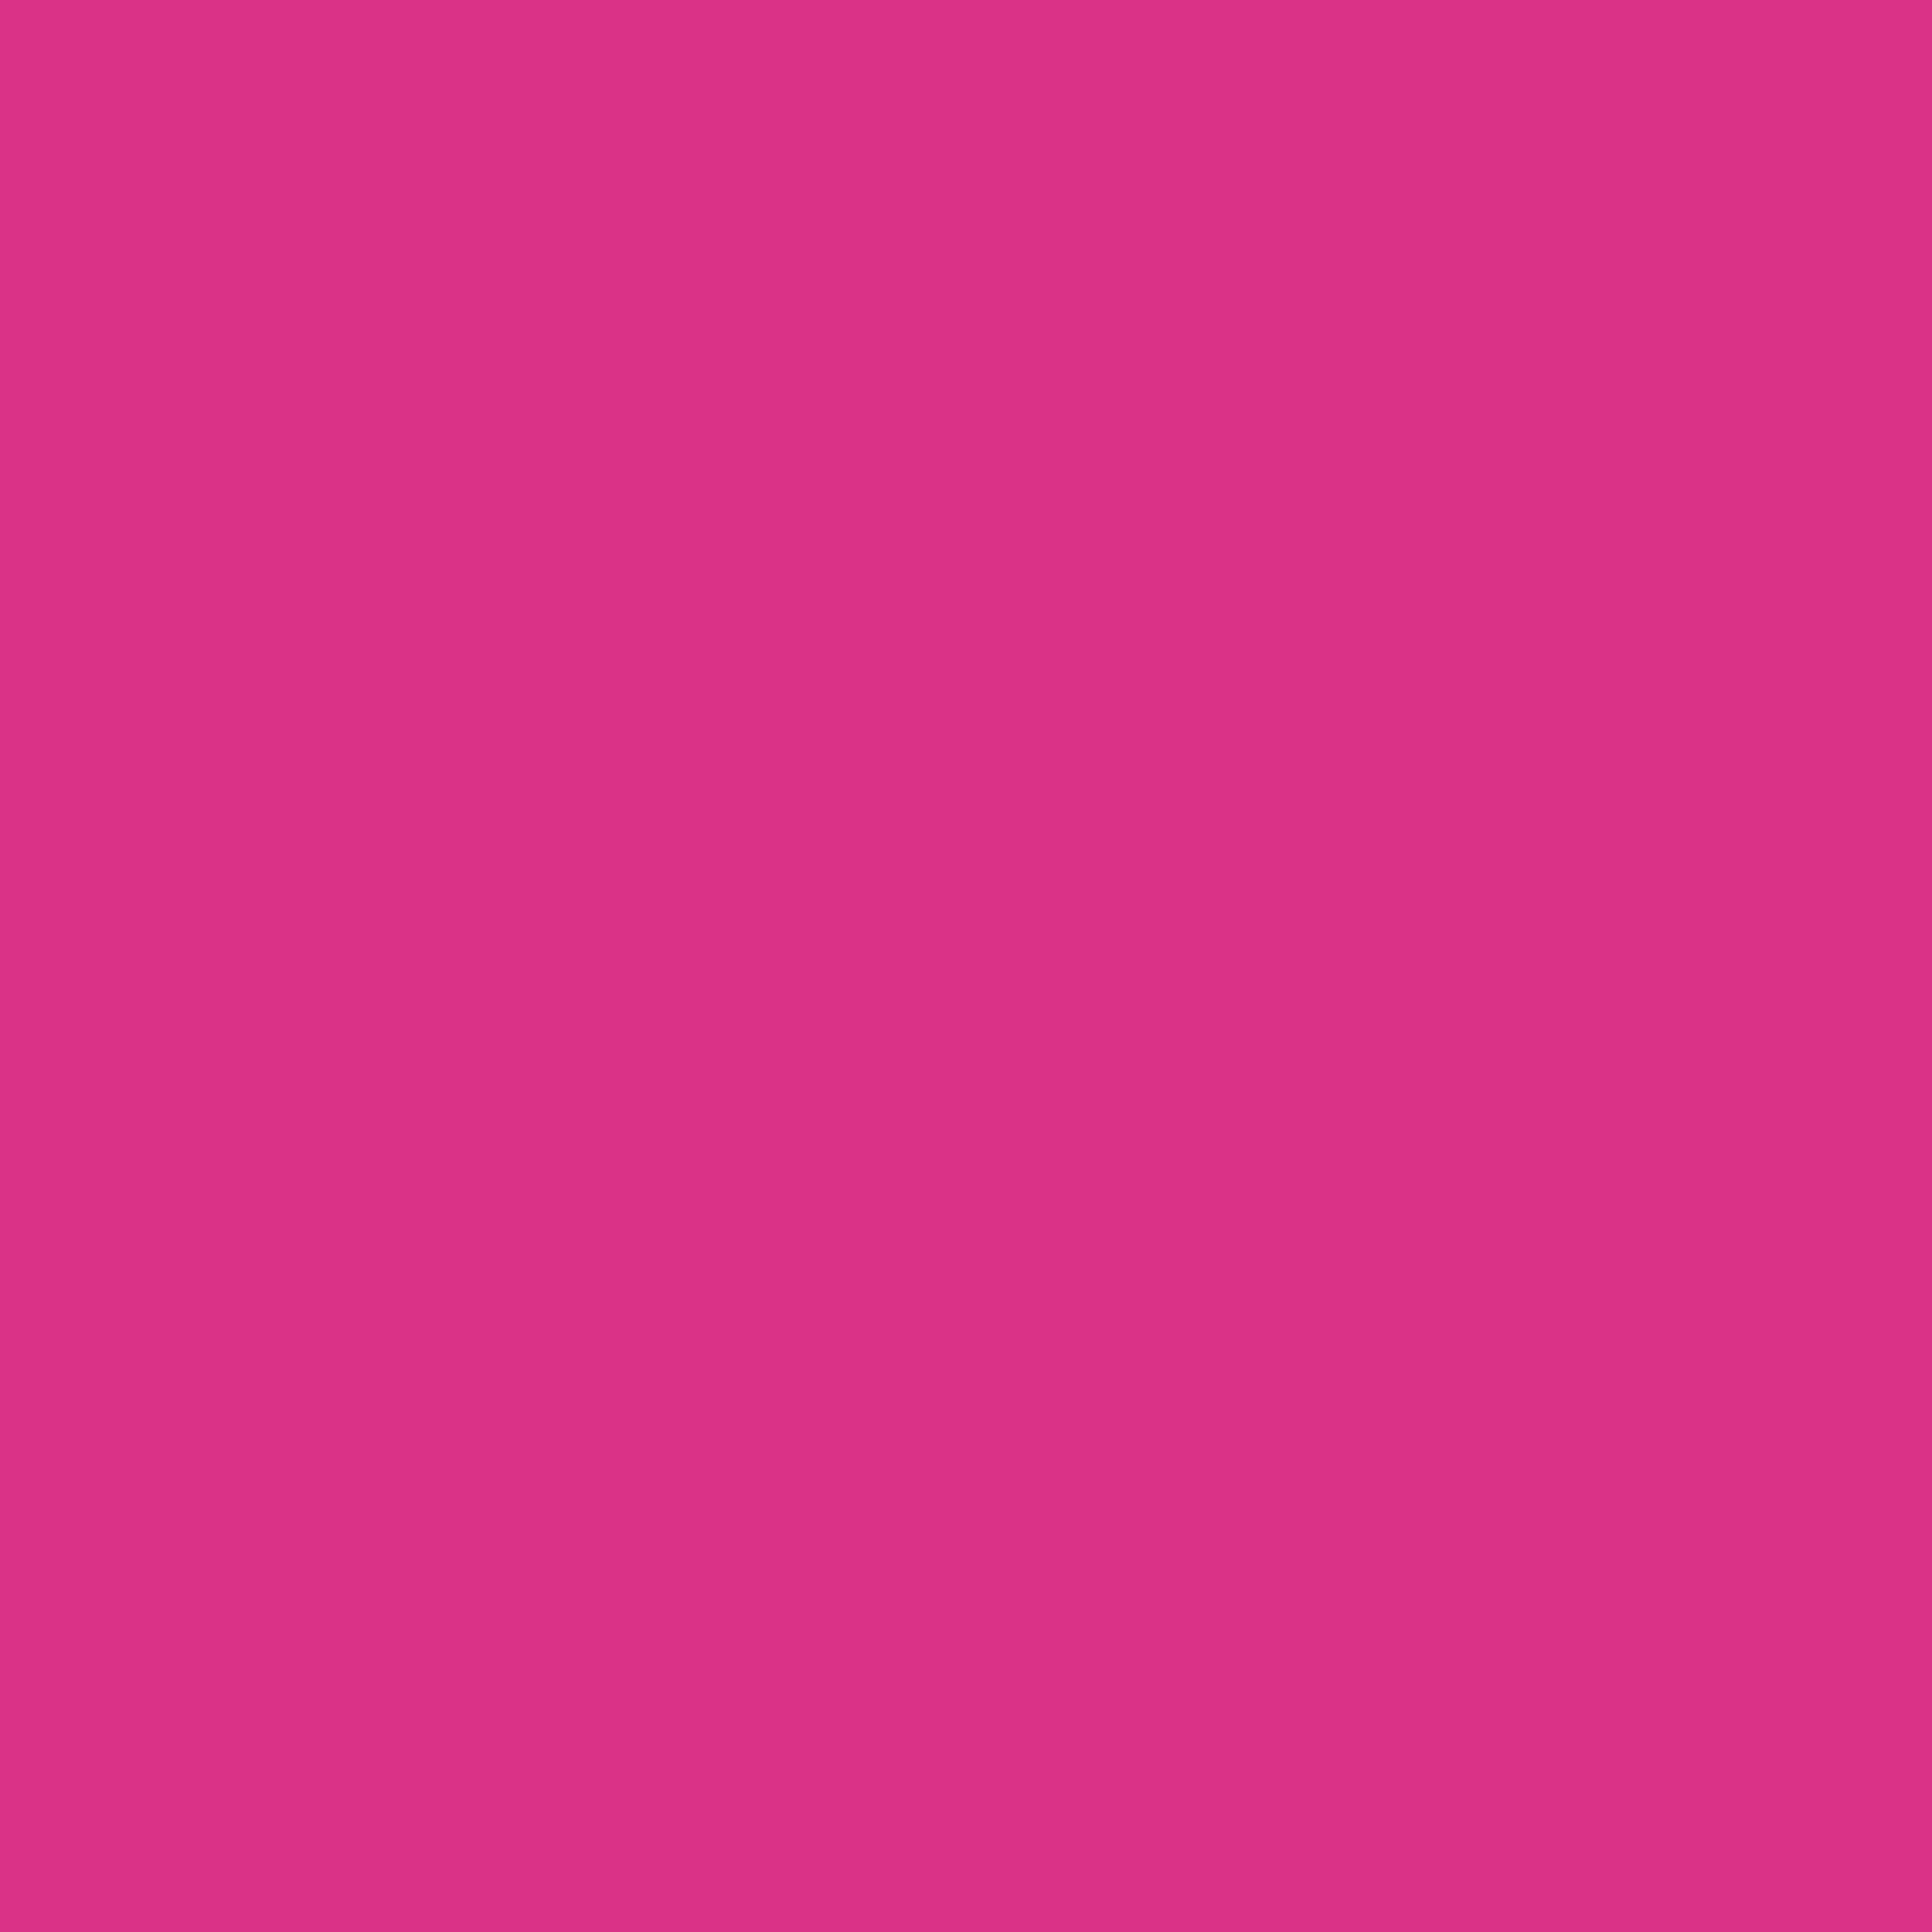 3600x3600 Deep Cerise Solid Color Background